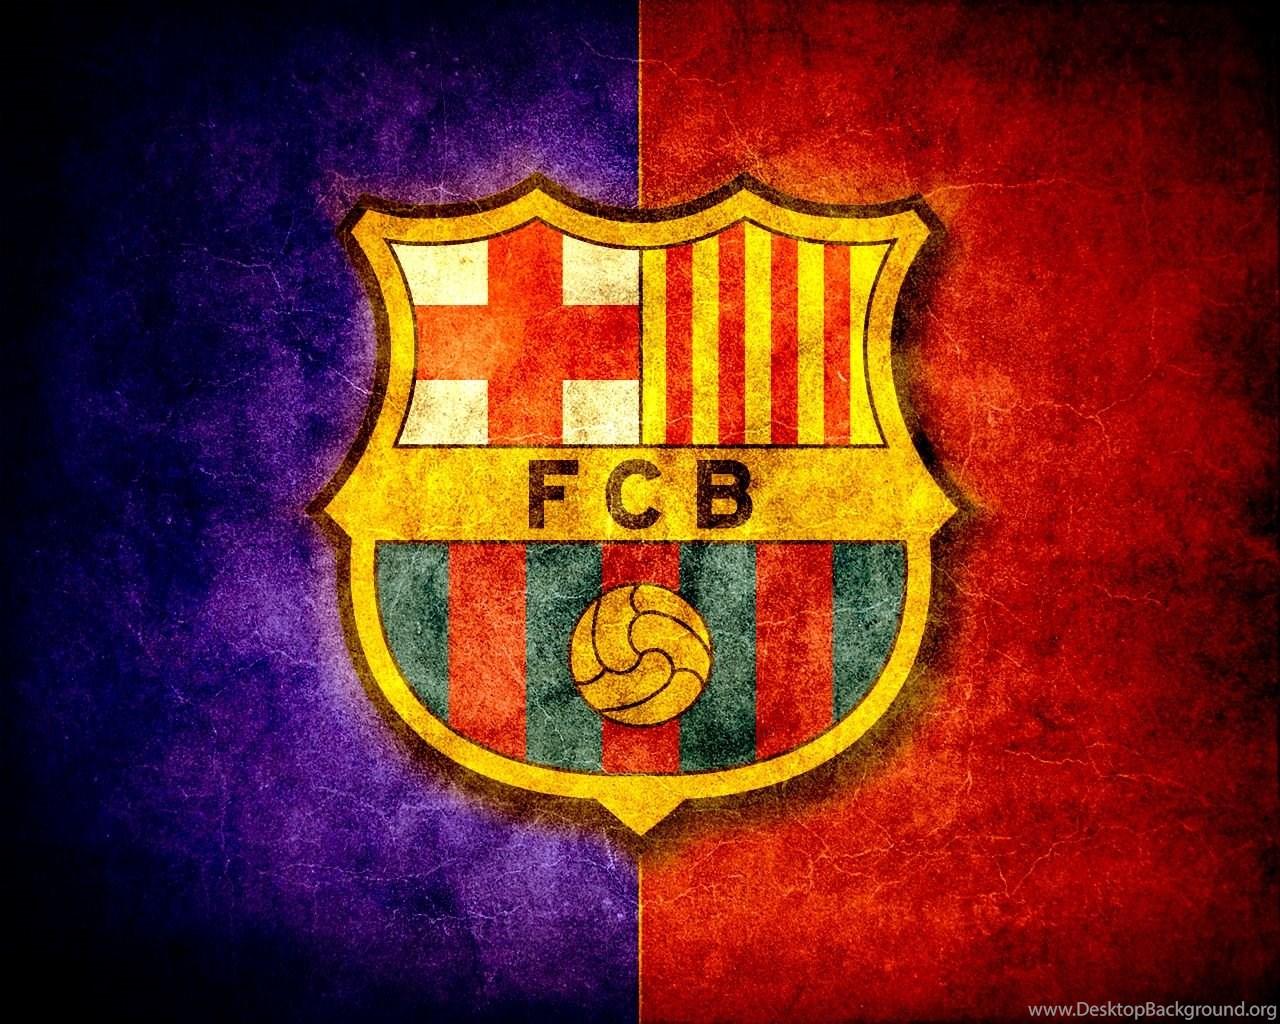 1191x842px Foto Barca Club Logo Desktop Background